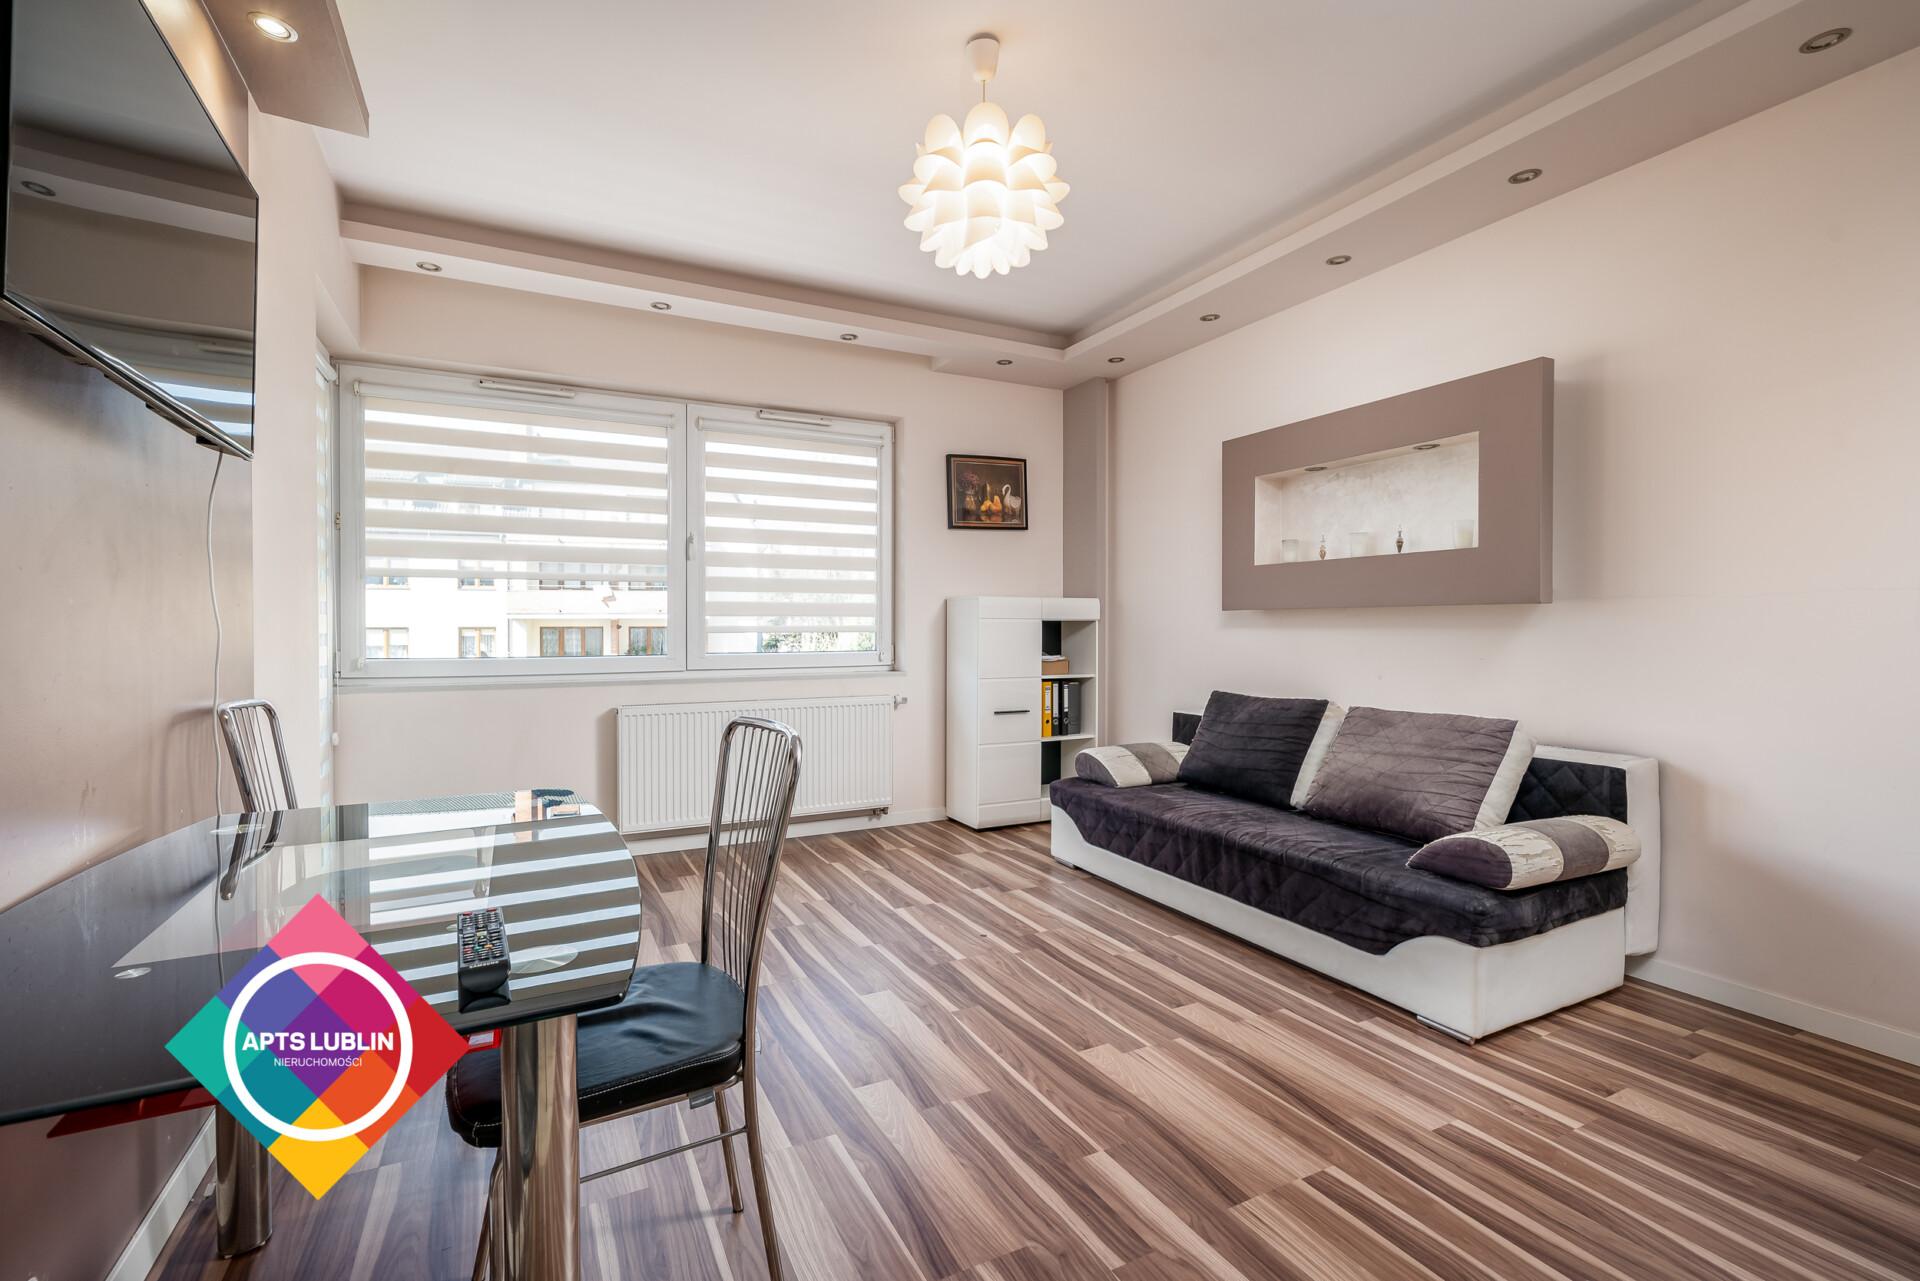 2 bedroom apartment, close to MUL.